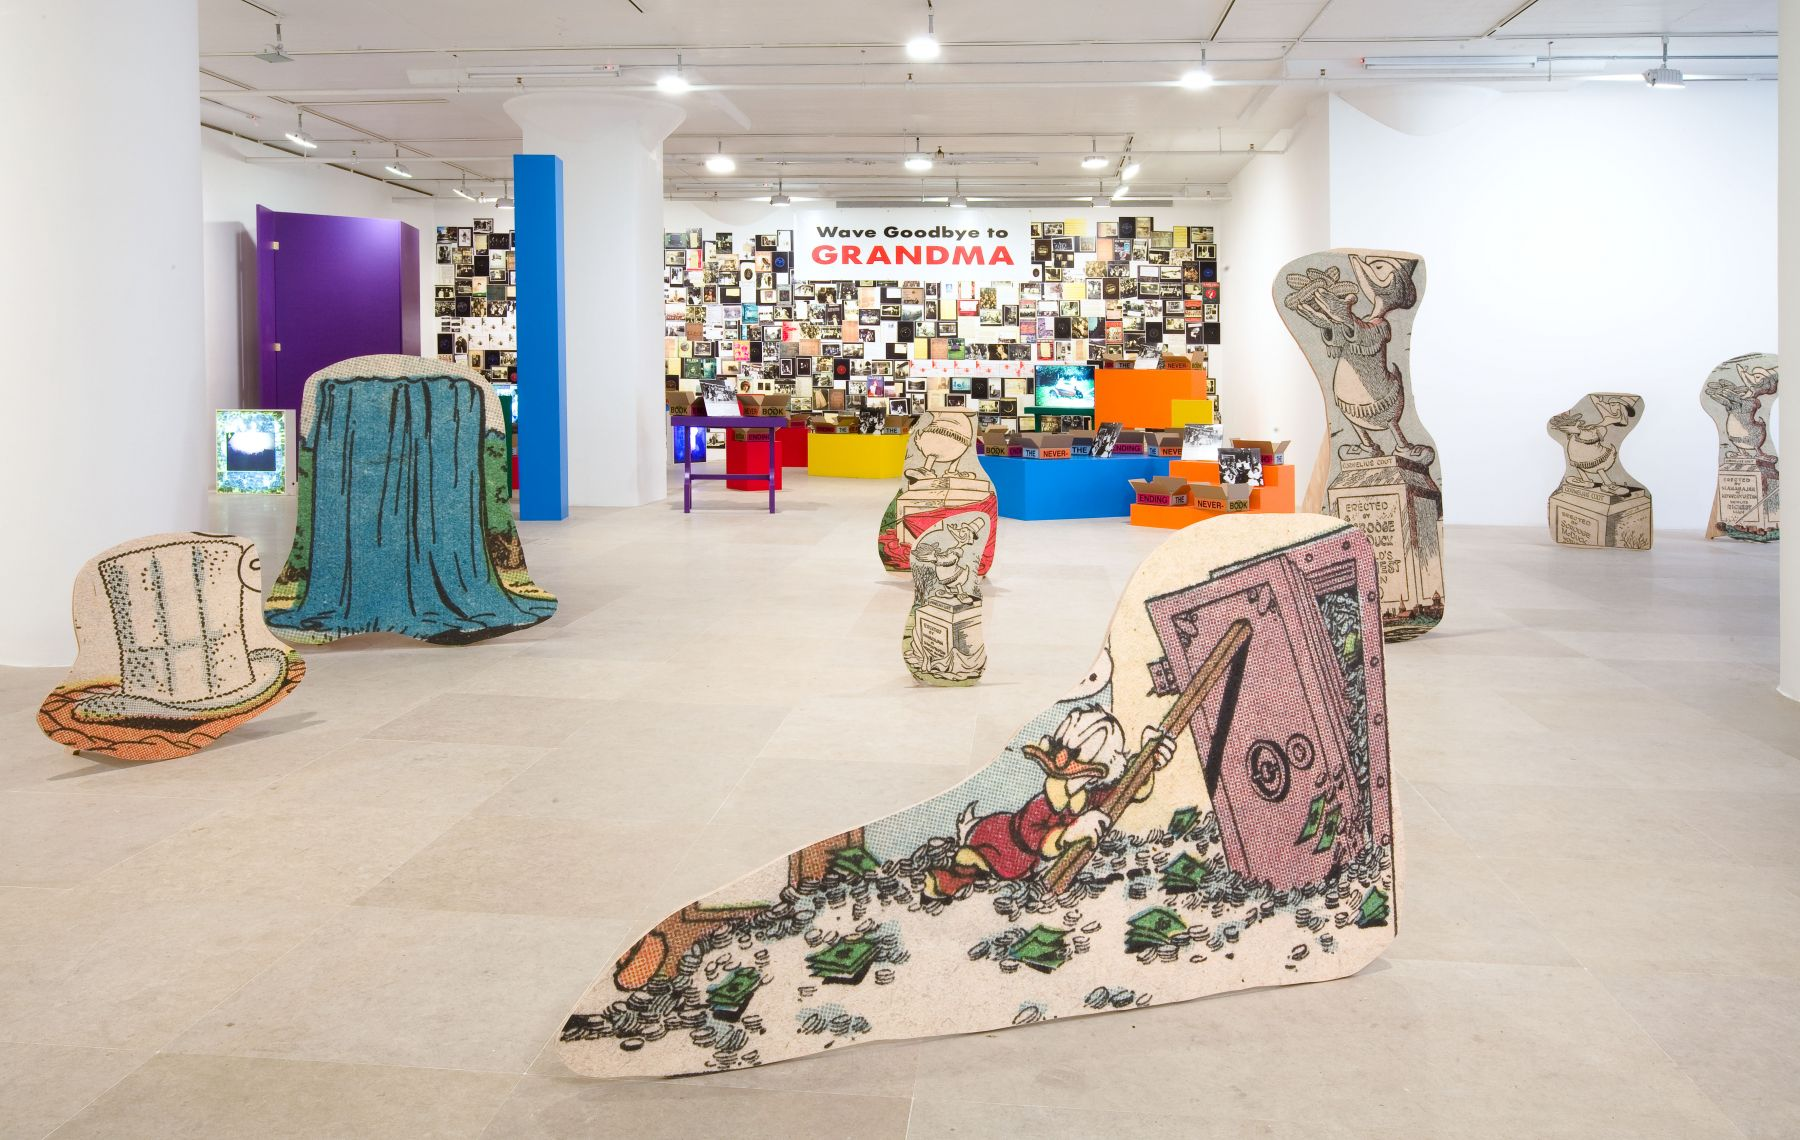 Installation view, Greene Naftali, New York, 2010